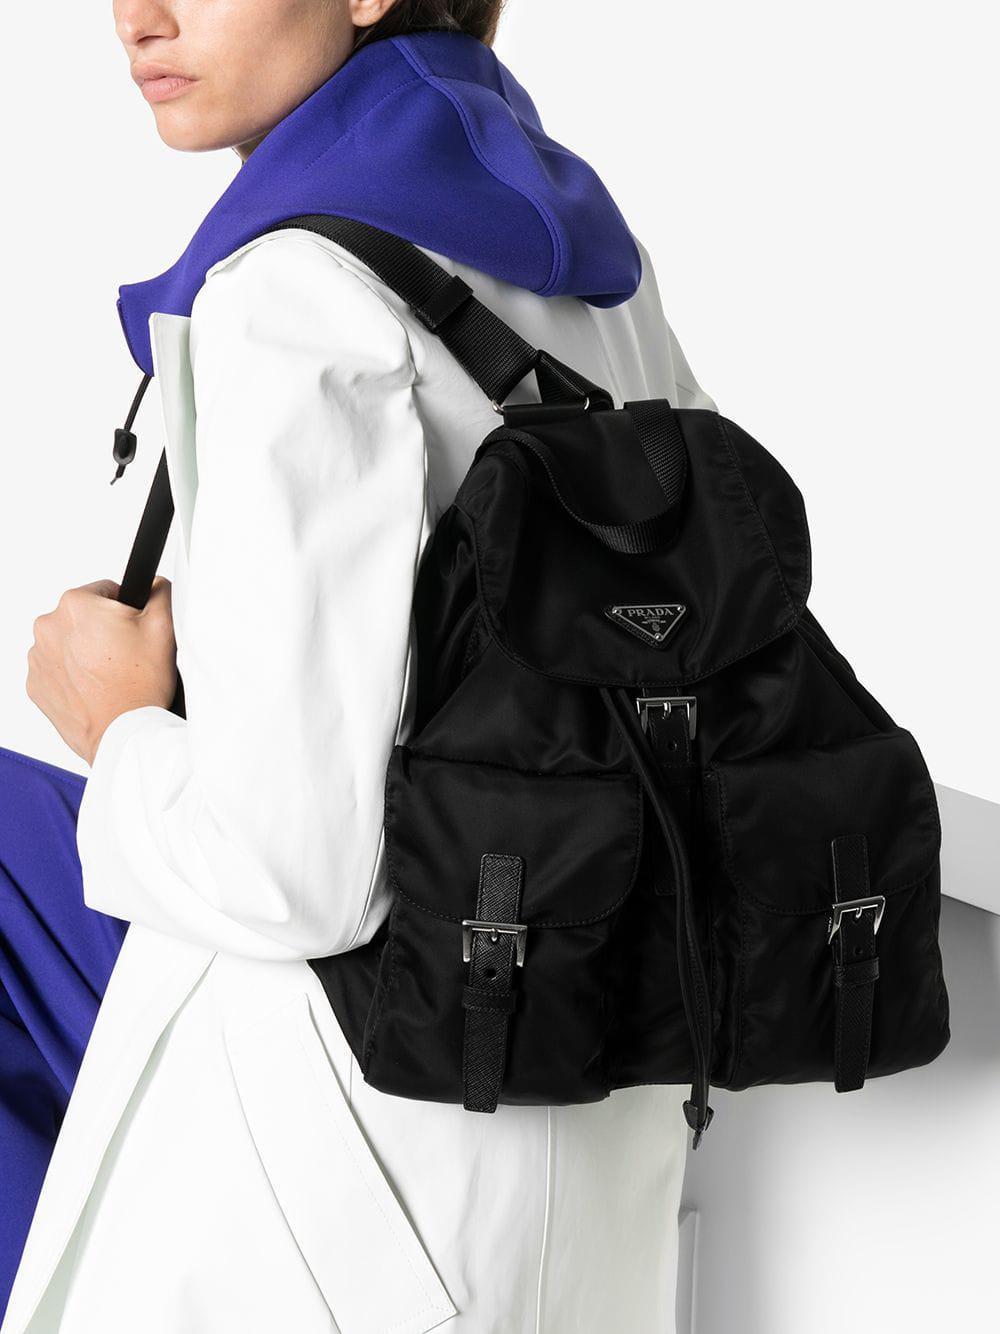 ddfa0fe8bb3a50 Lyst - Prada Black Classic Nylon Backpack in Black